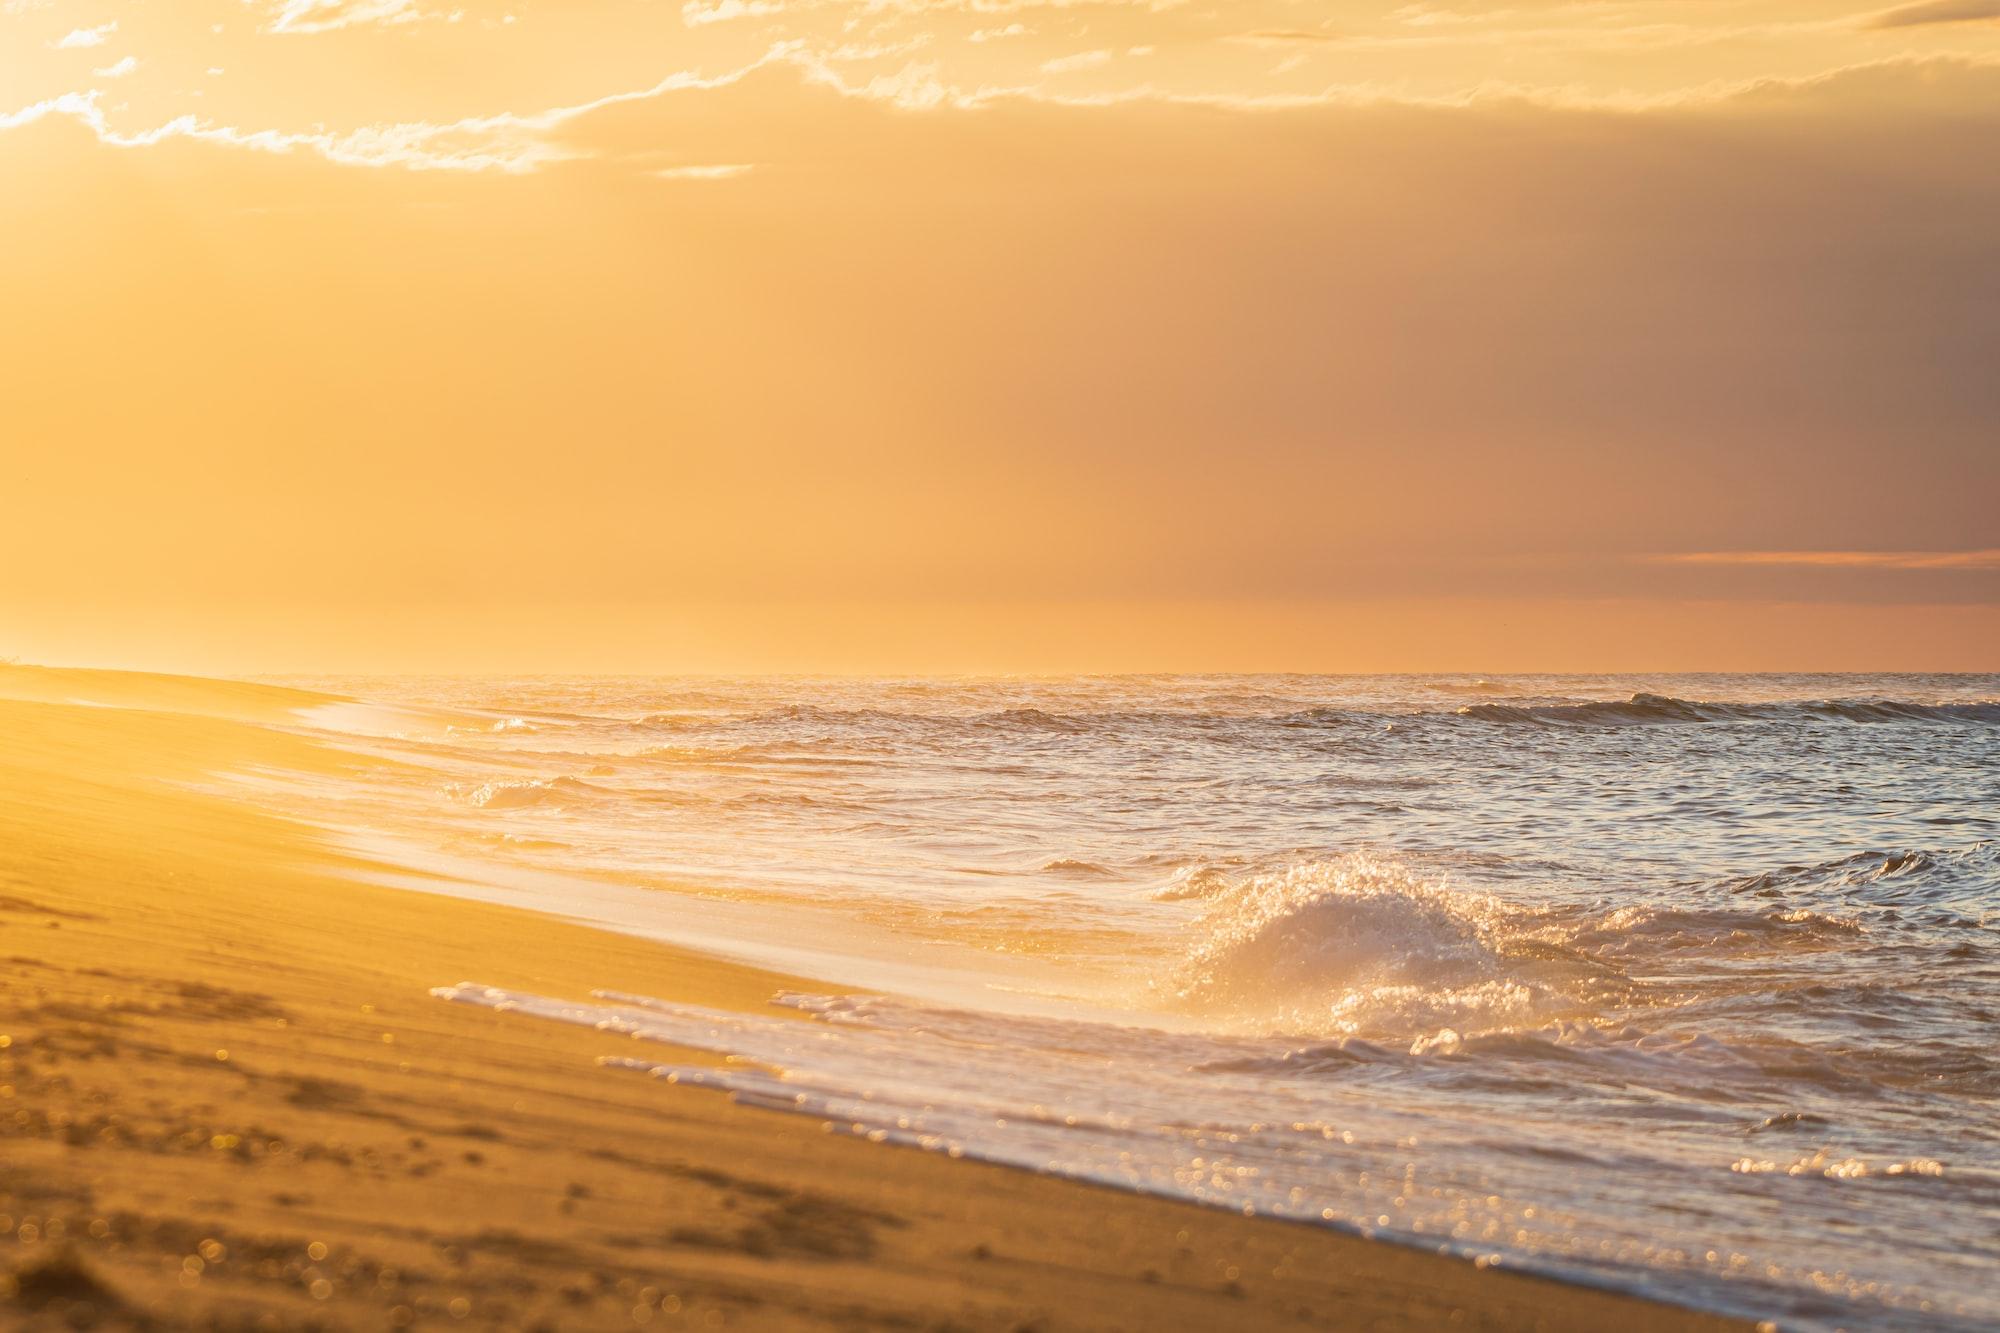 Atlantic Ocean Waves during golden sunset